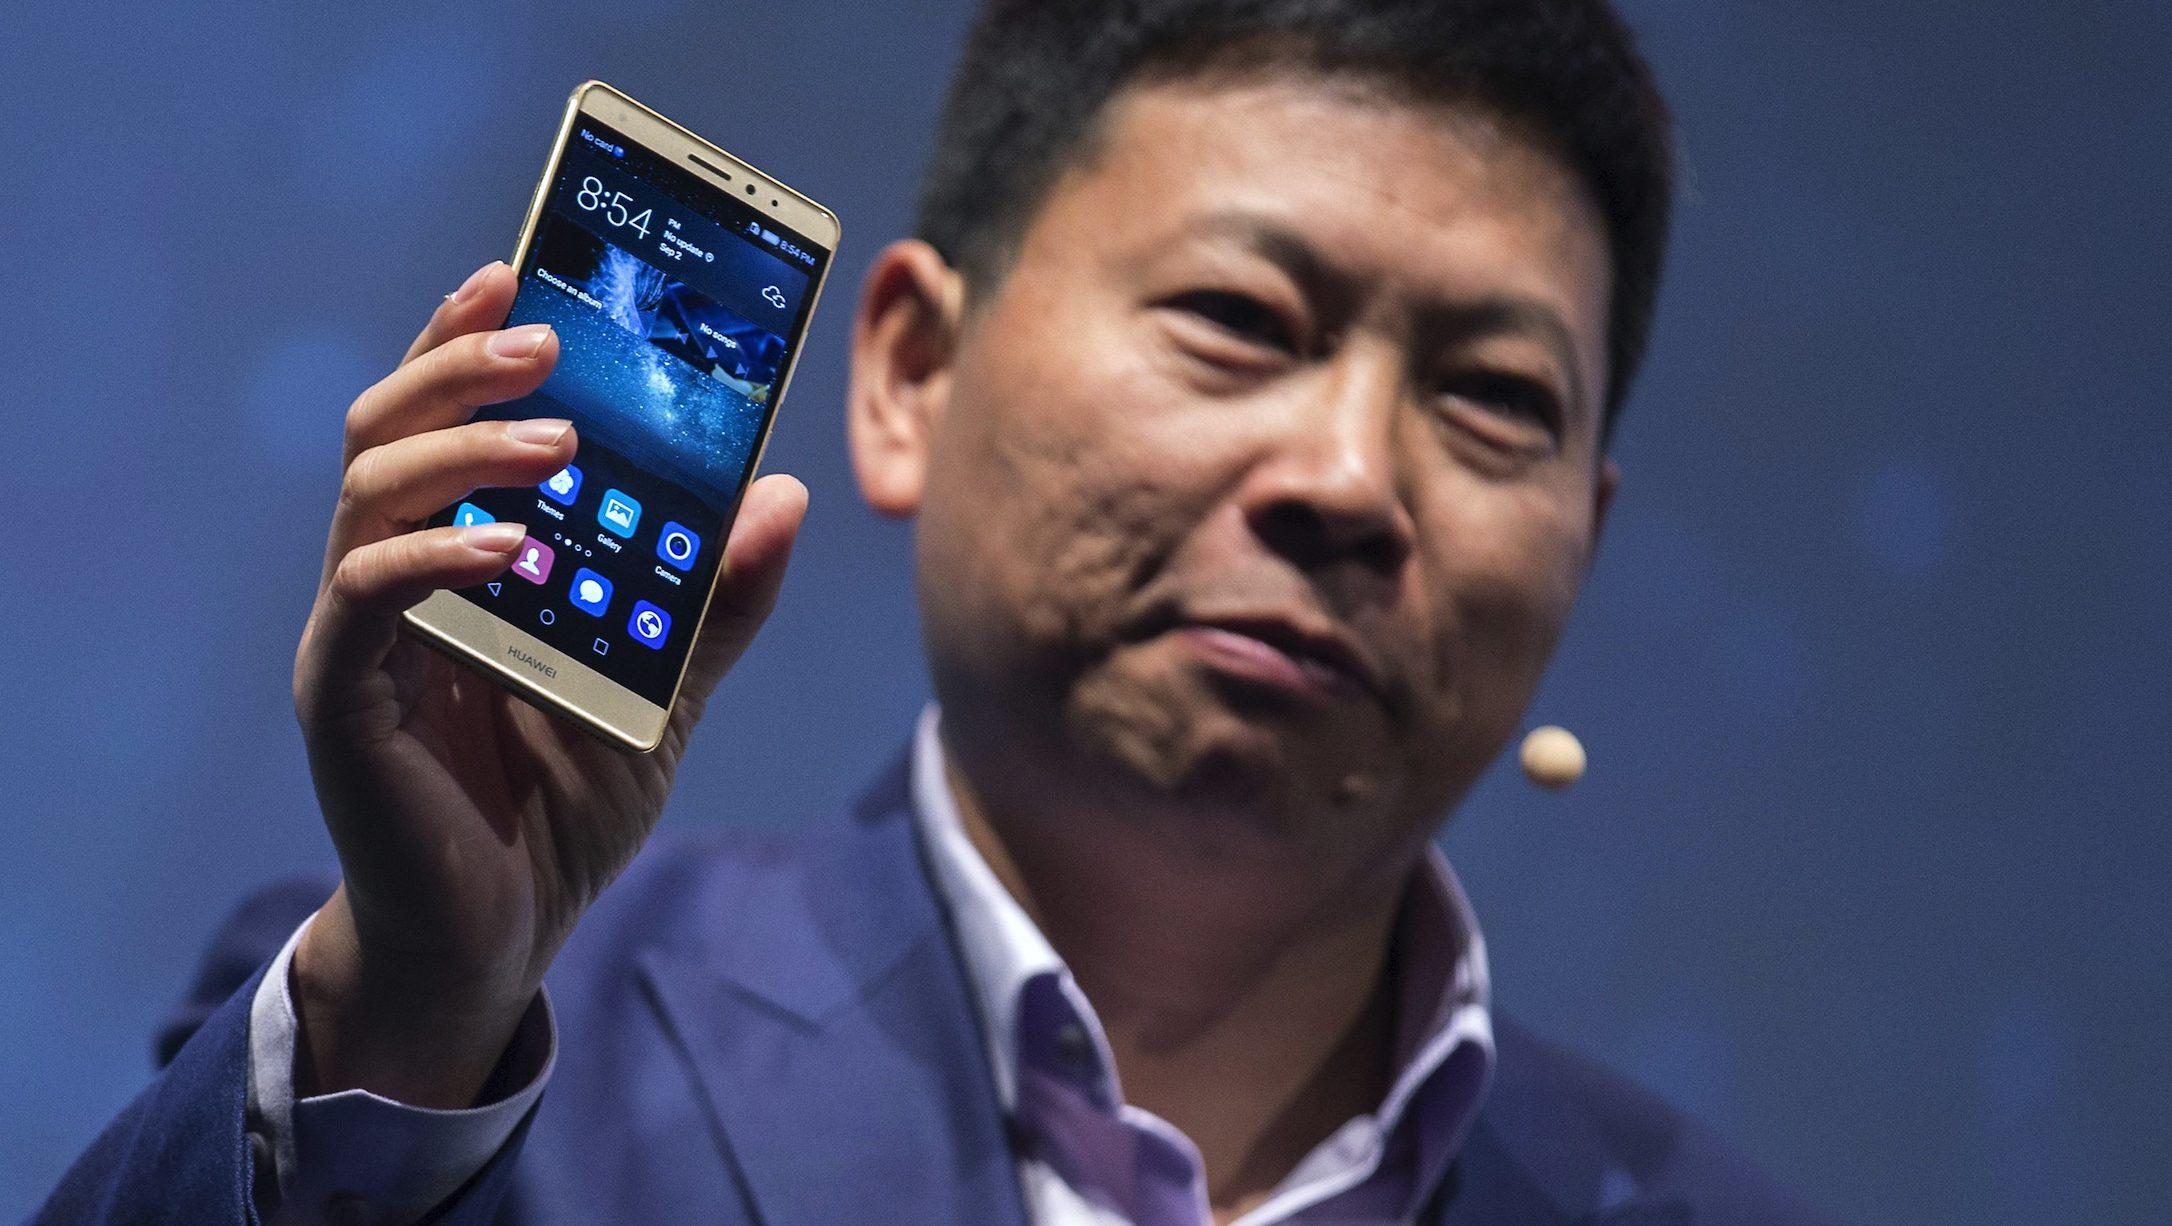 huawei-ceo-richard-yu-presents-huaweis-new-smartphone-e1474283438491